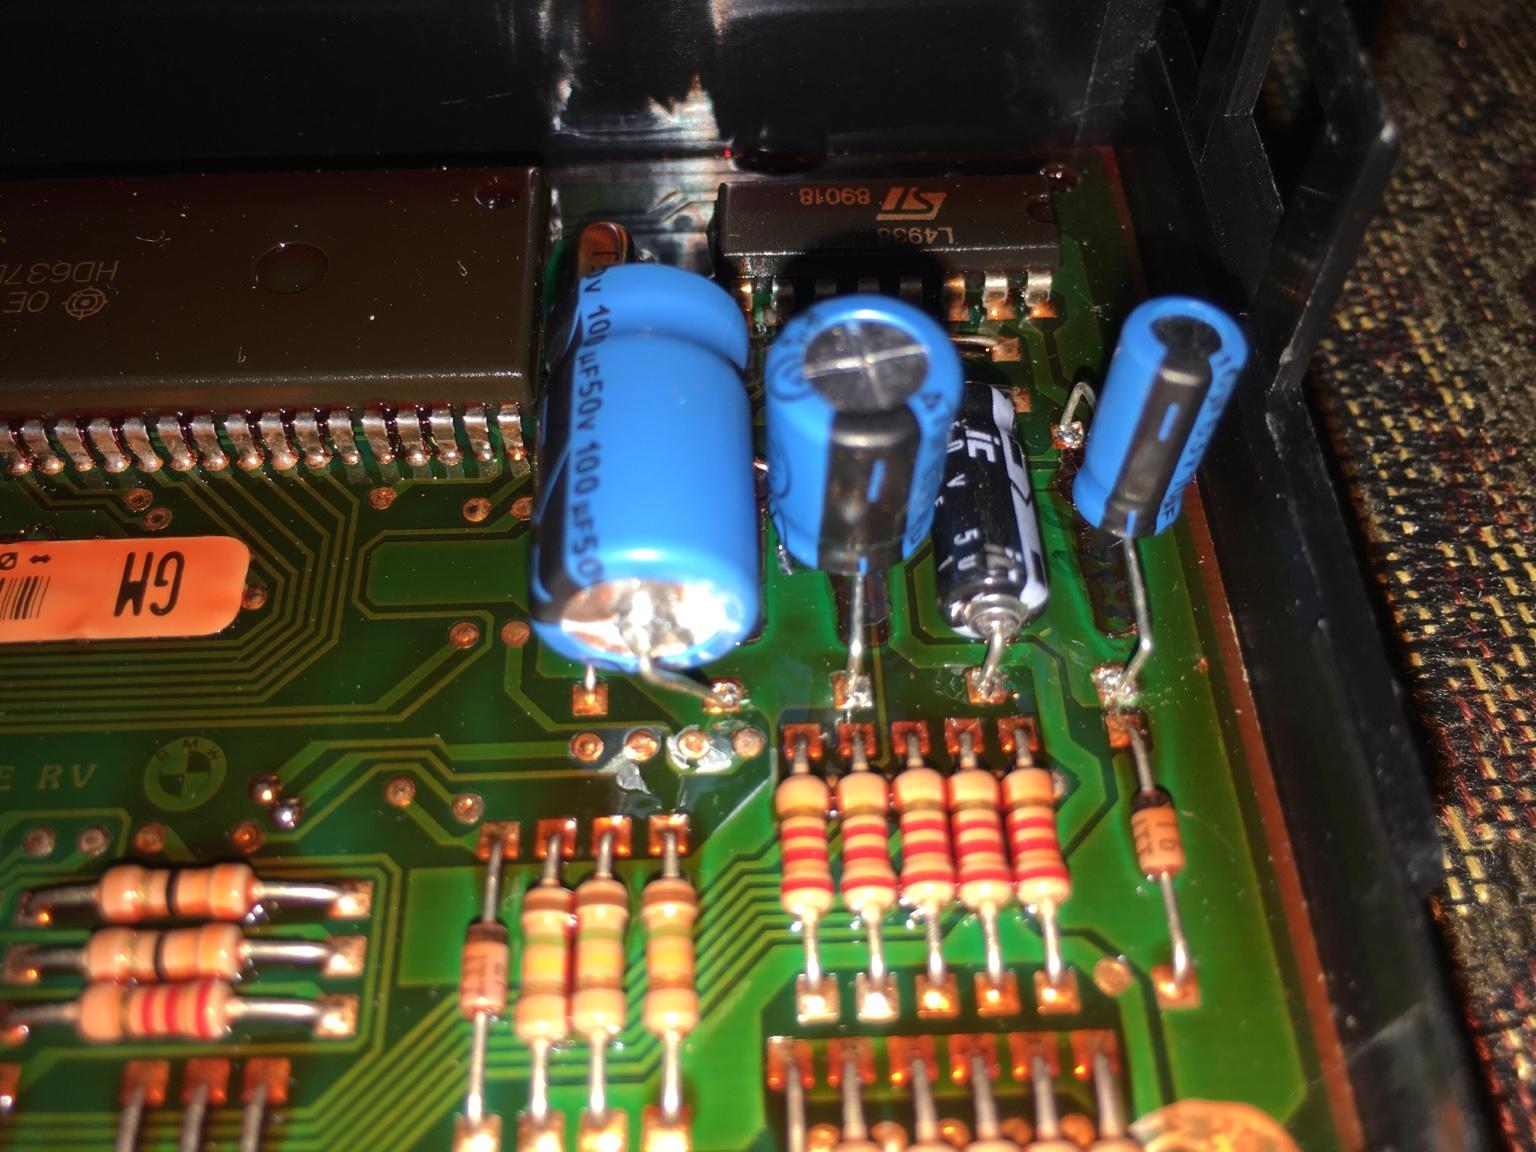 Success In General Module Repair Archive Bimmerforums The Track Damage Capacitors Elco With Esr Meter Ultimate Bmw Forum